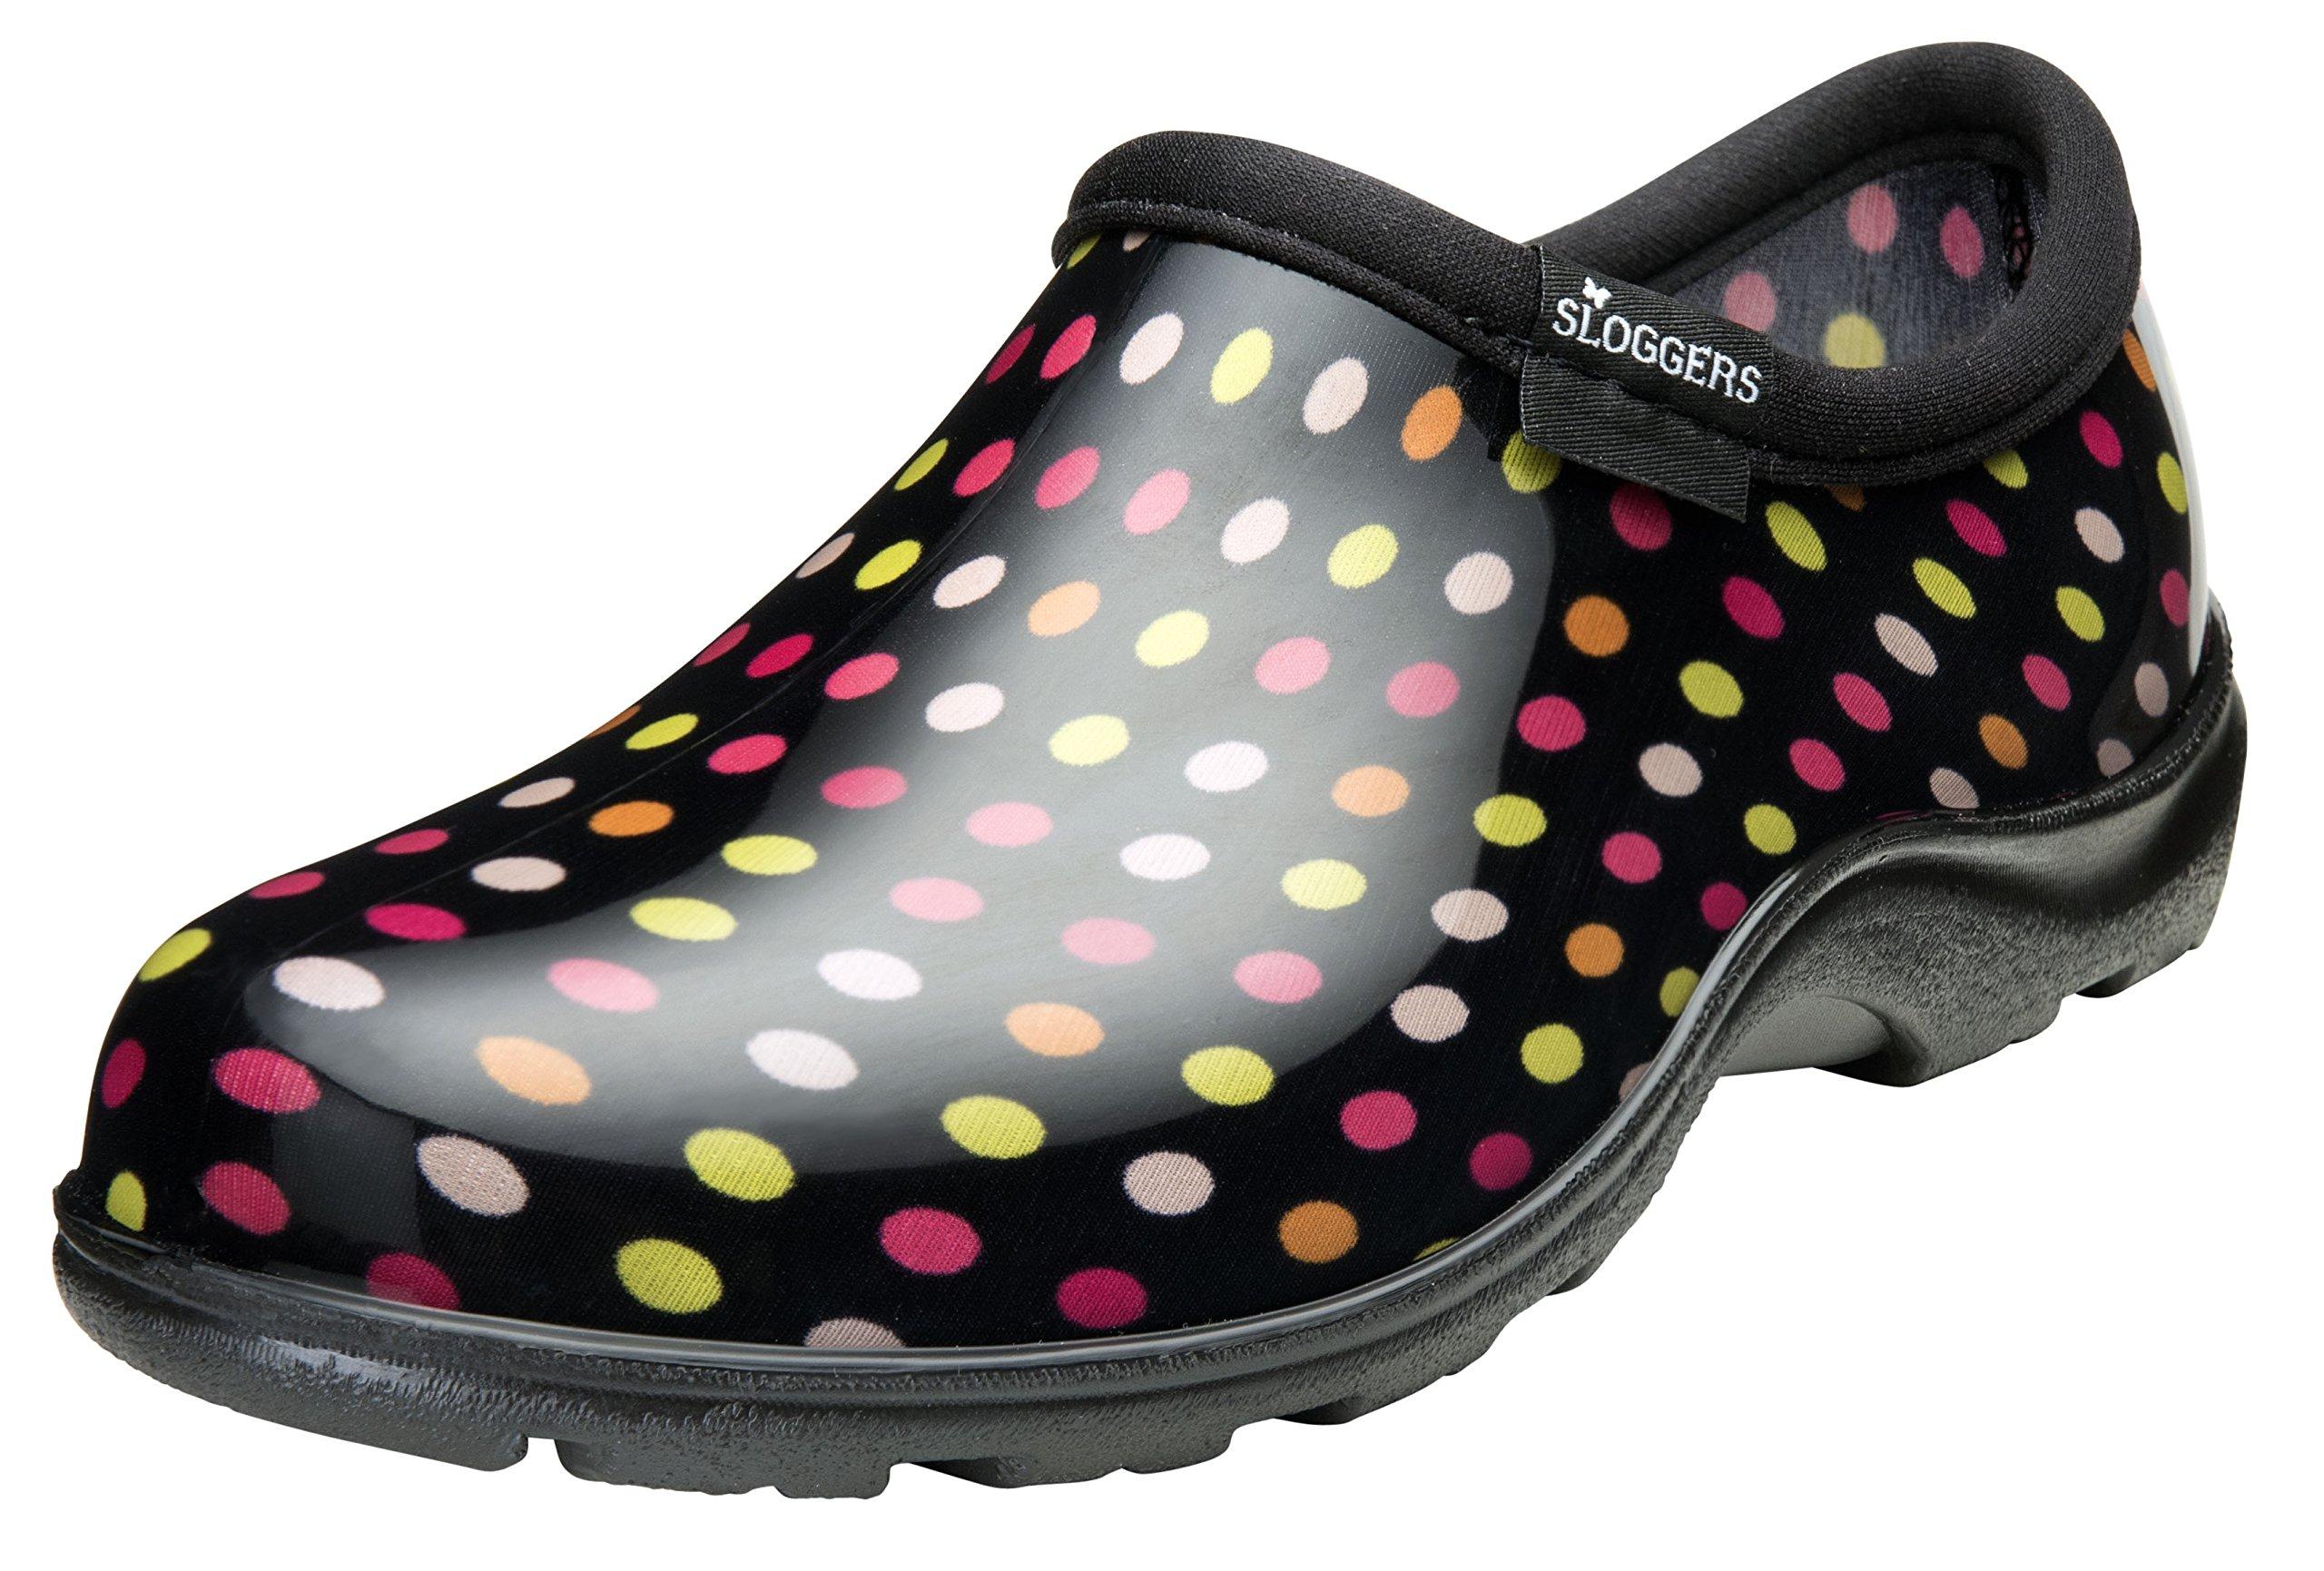 Sloggers Women's Rain and Garden Polka Dot Shoe, Size 9, Multicolor